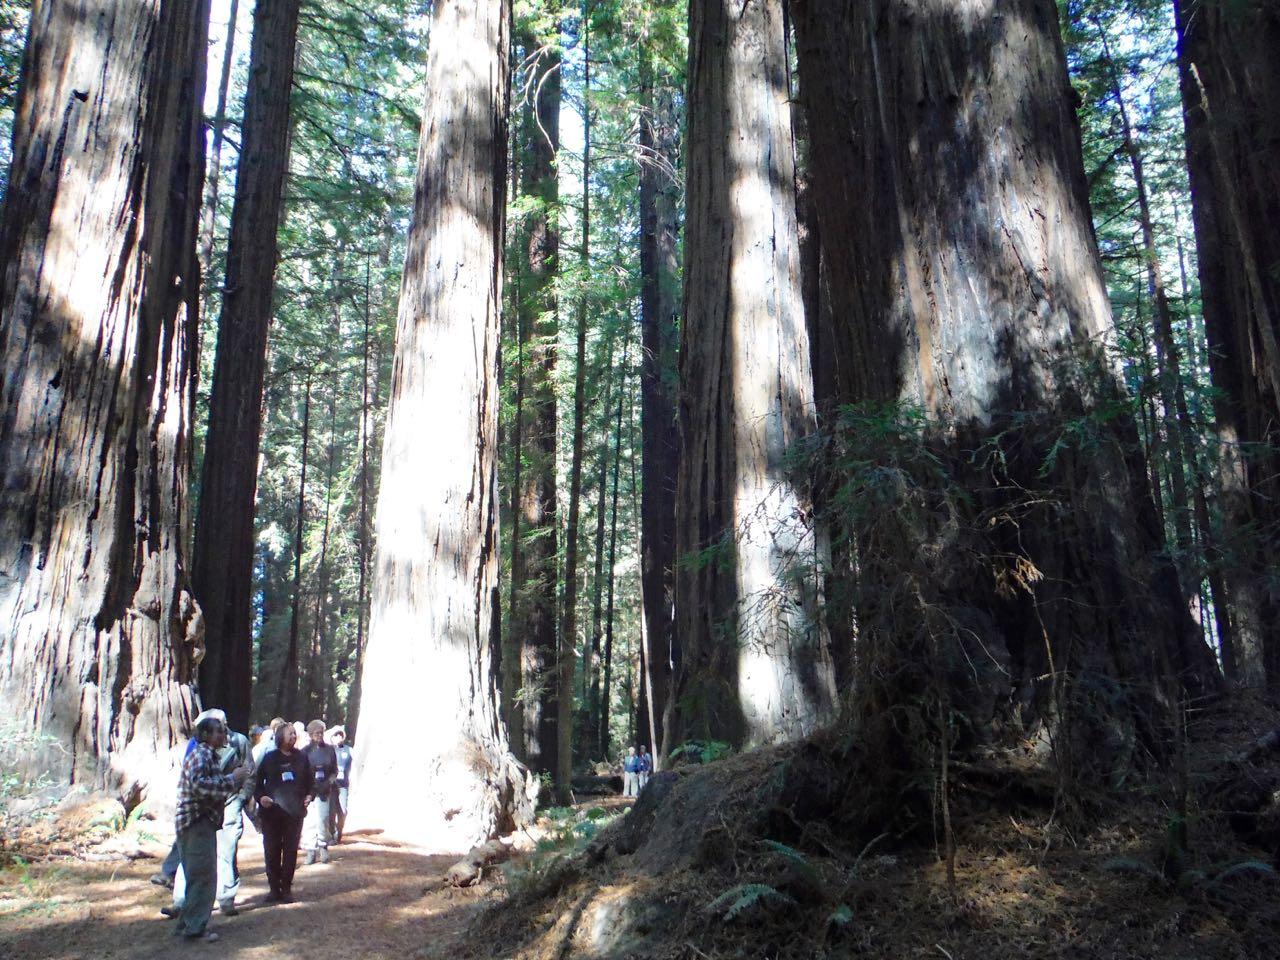 Redwoods 2017 10 08 34 Of 287